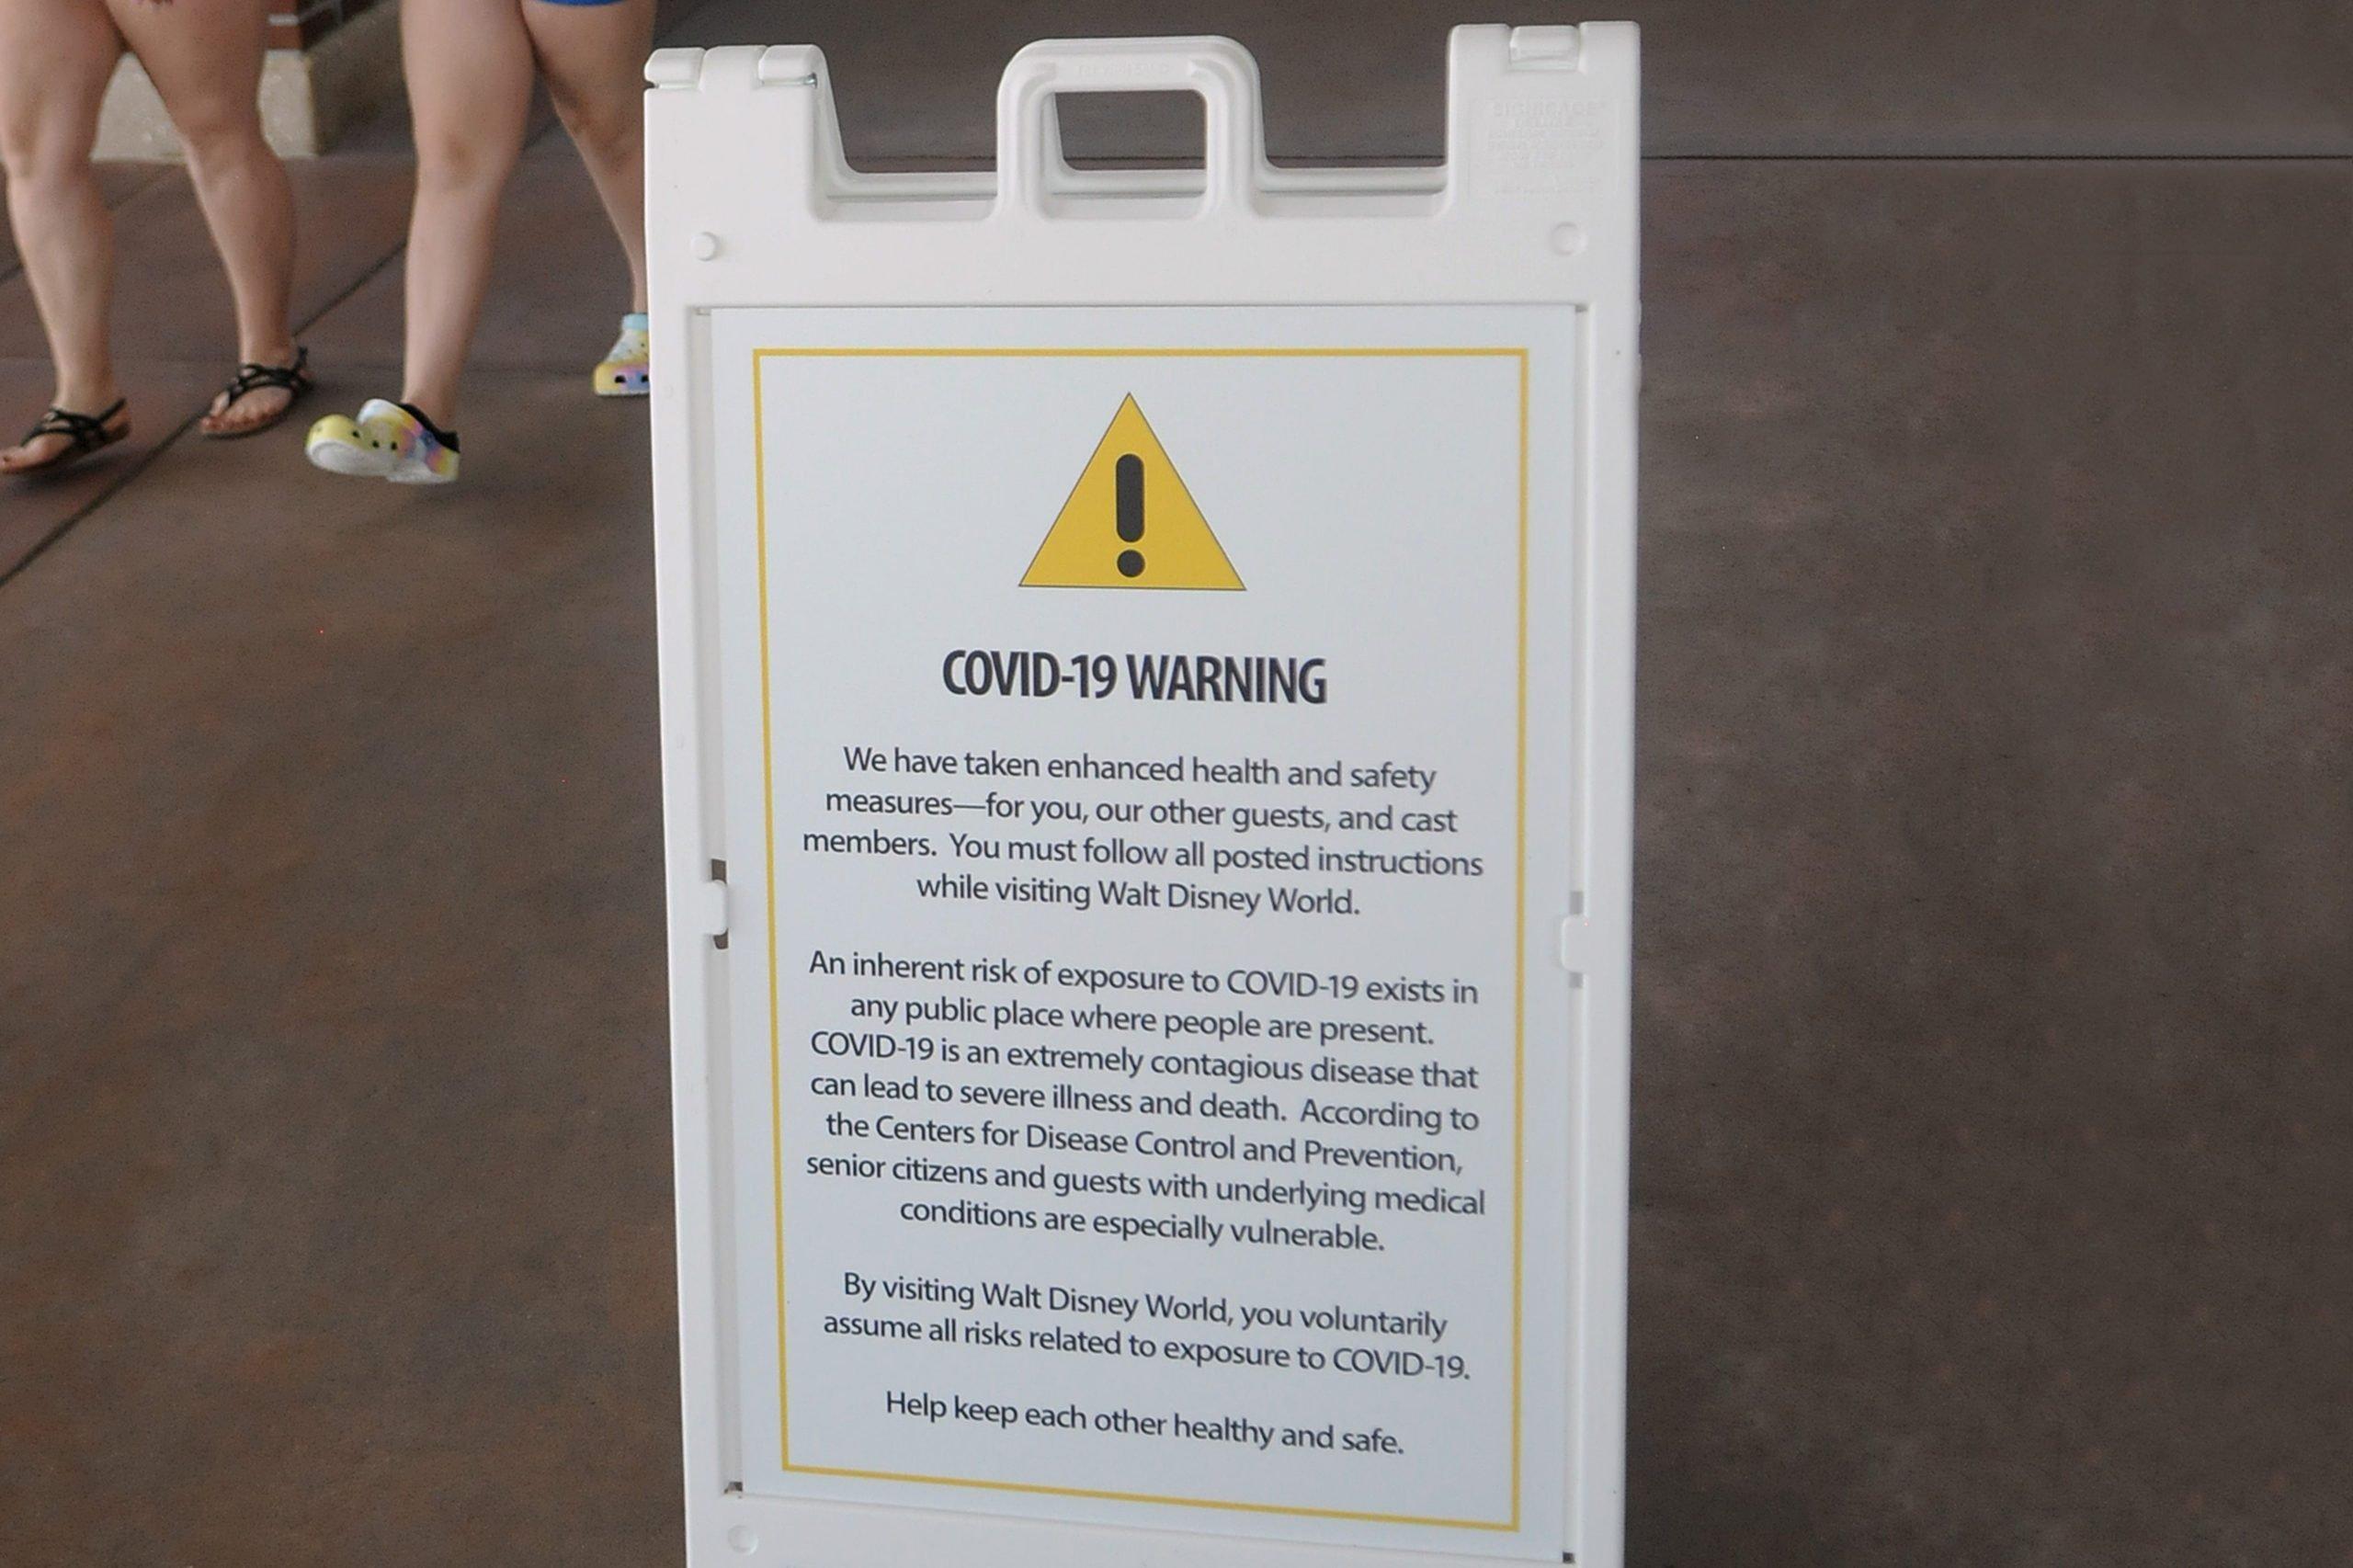 A COVID-19 warning sign is seen at Disney Springs at Walt